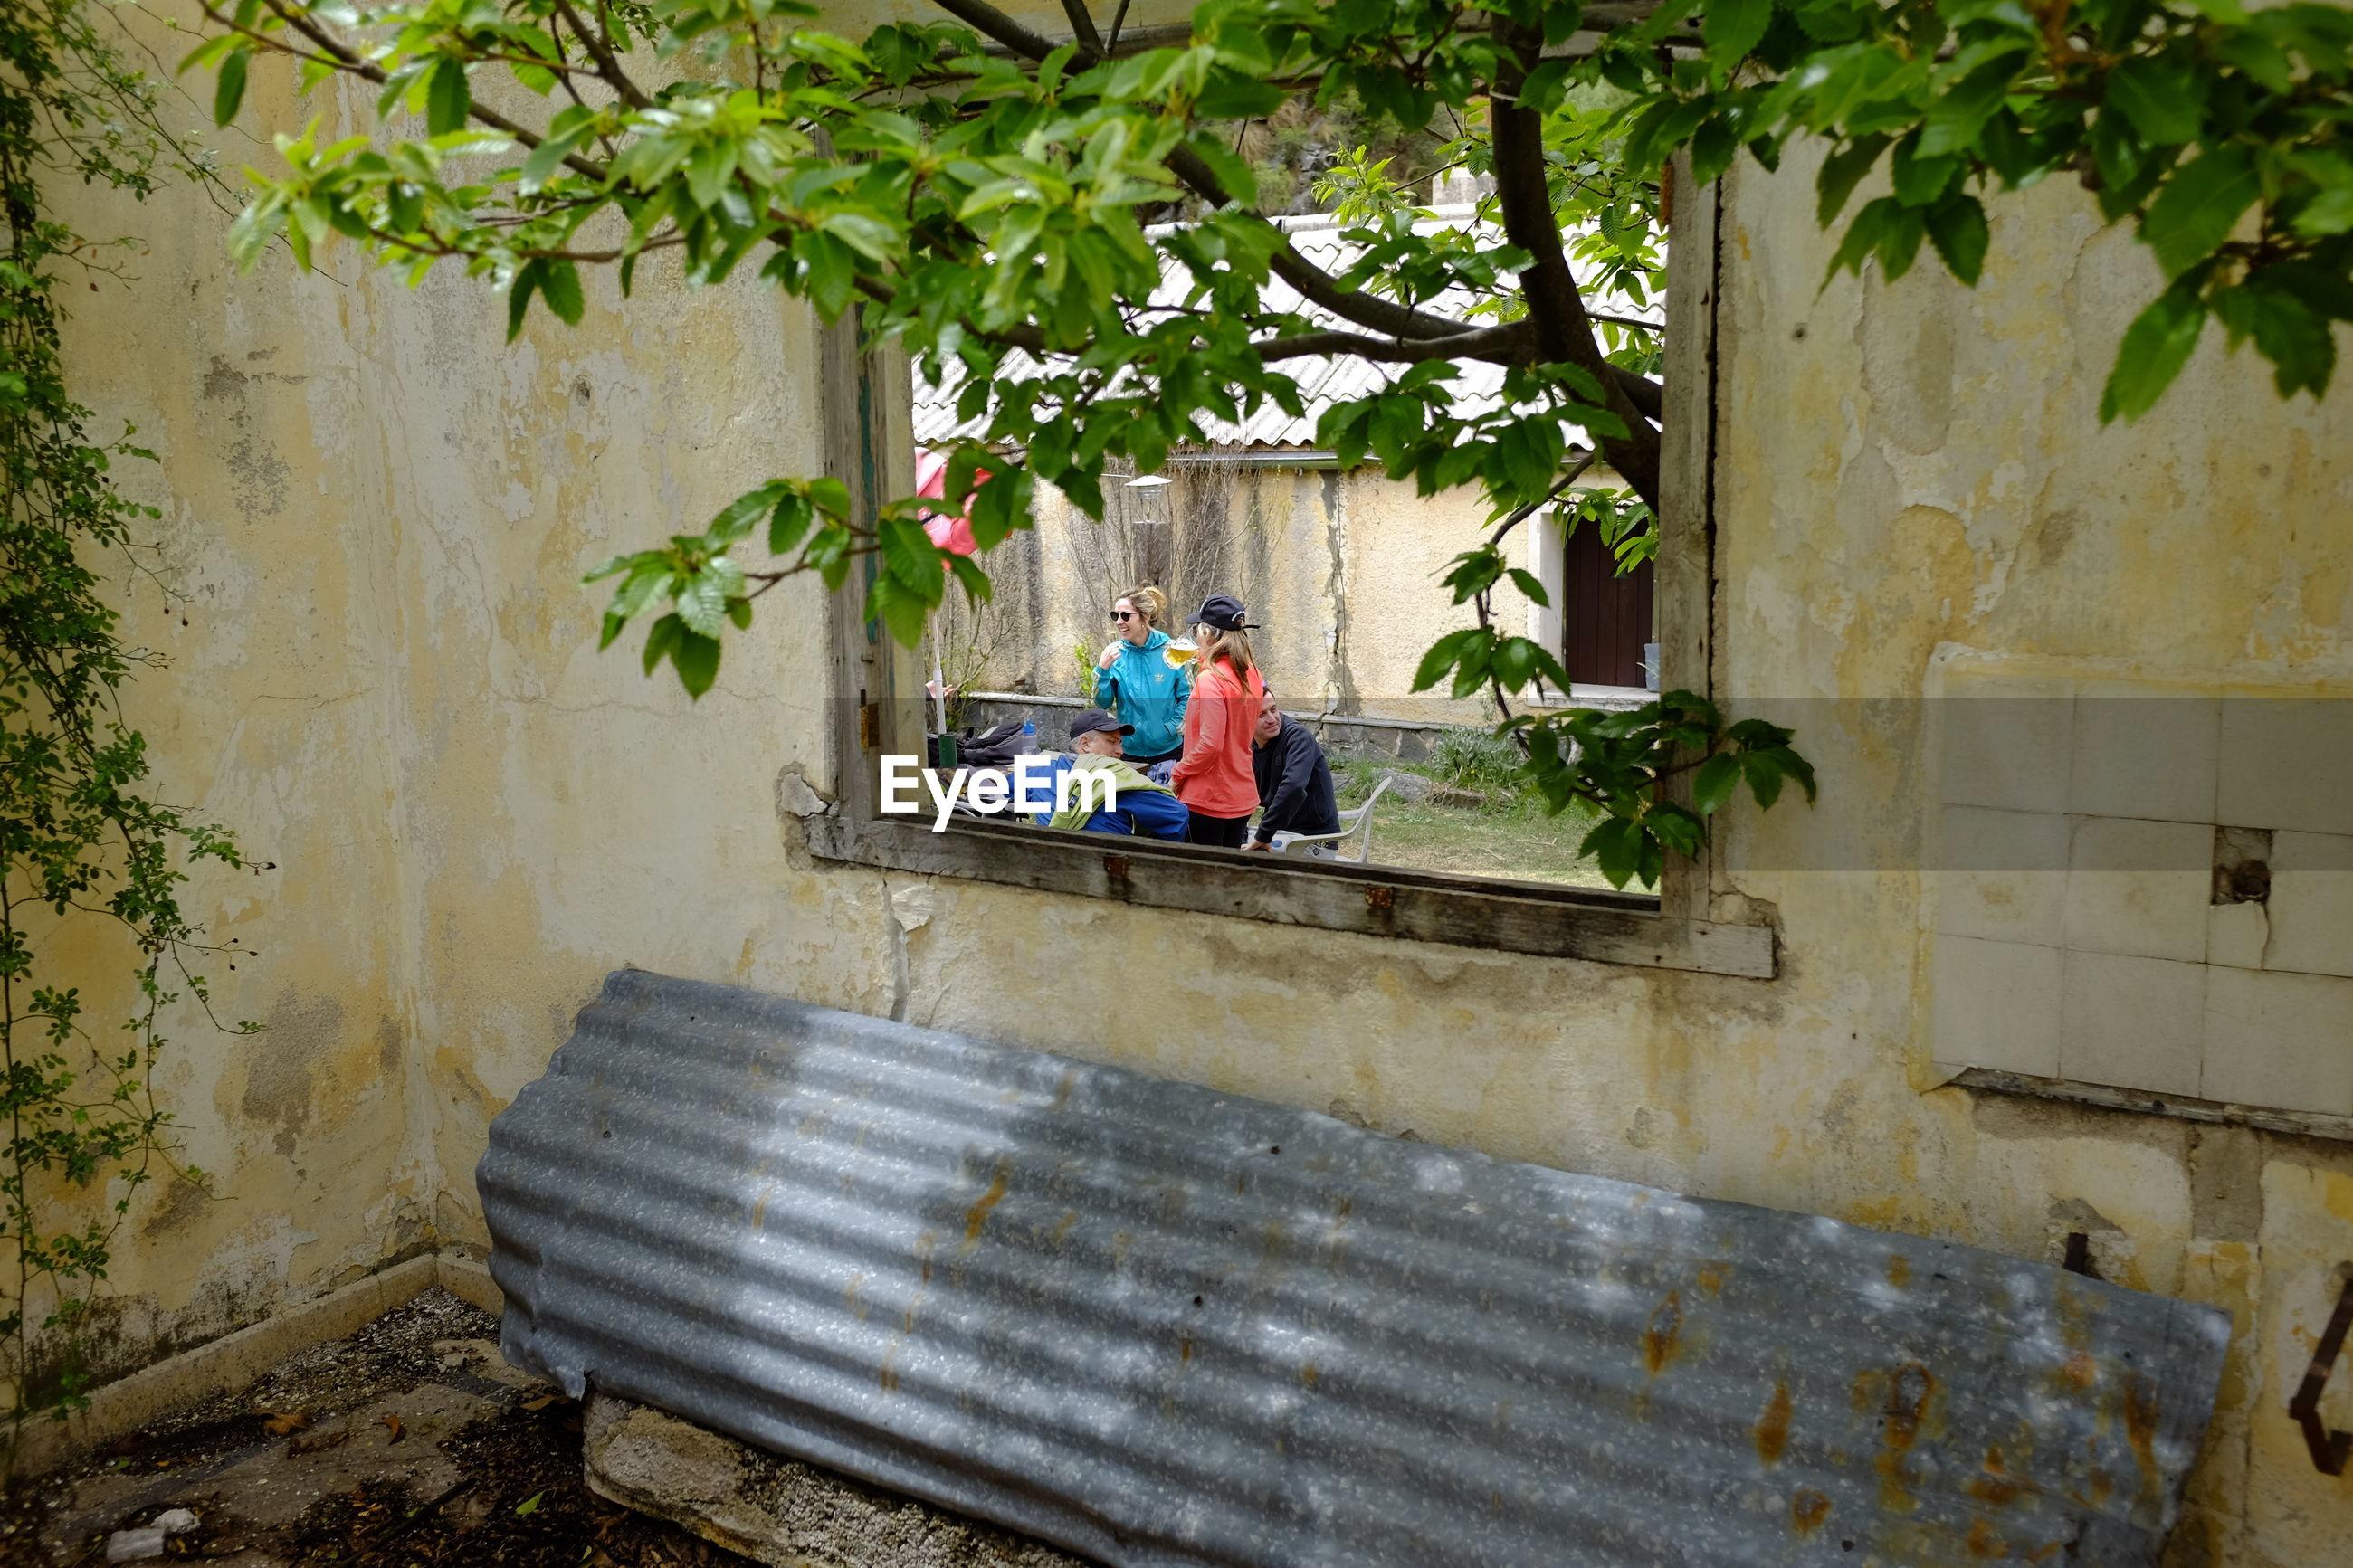 People on land seen through window